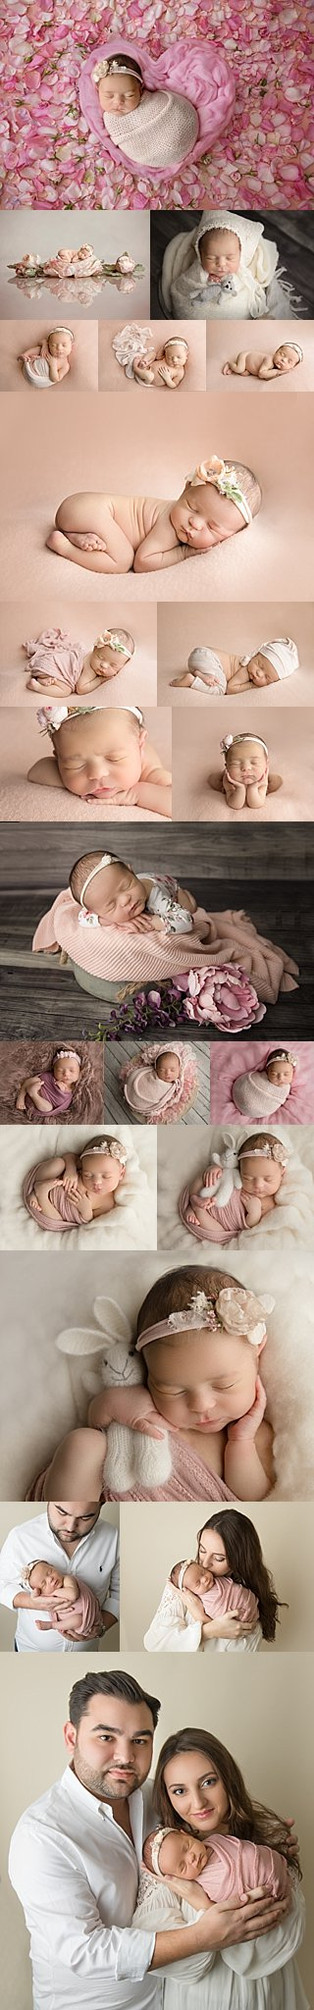 Bergen County New Jersey Newborn Photographer  | Baby Leona